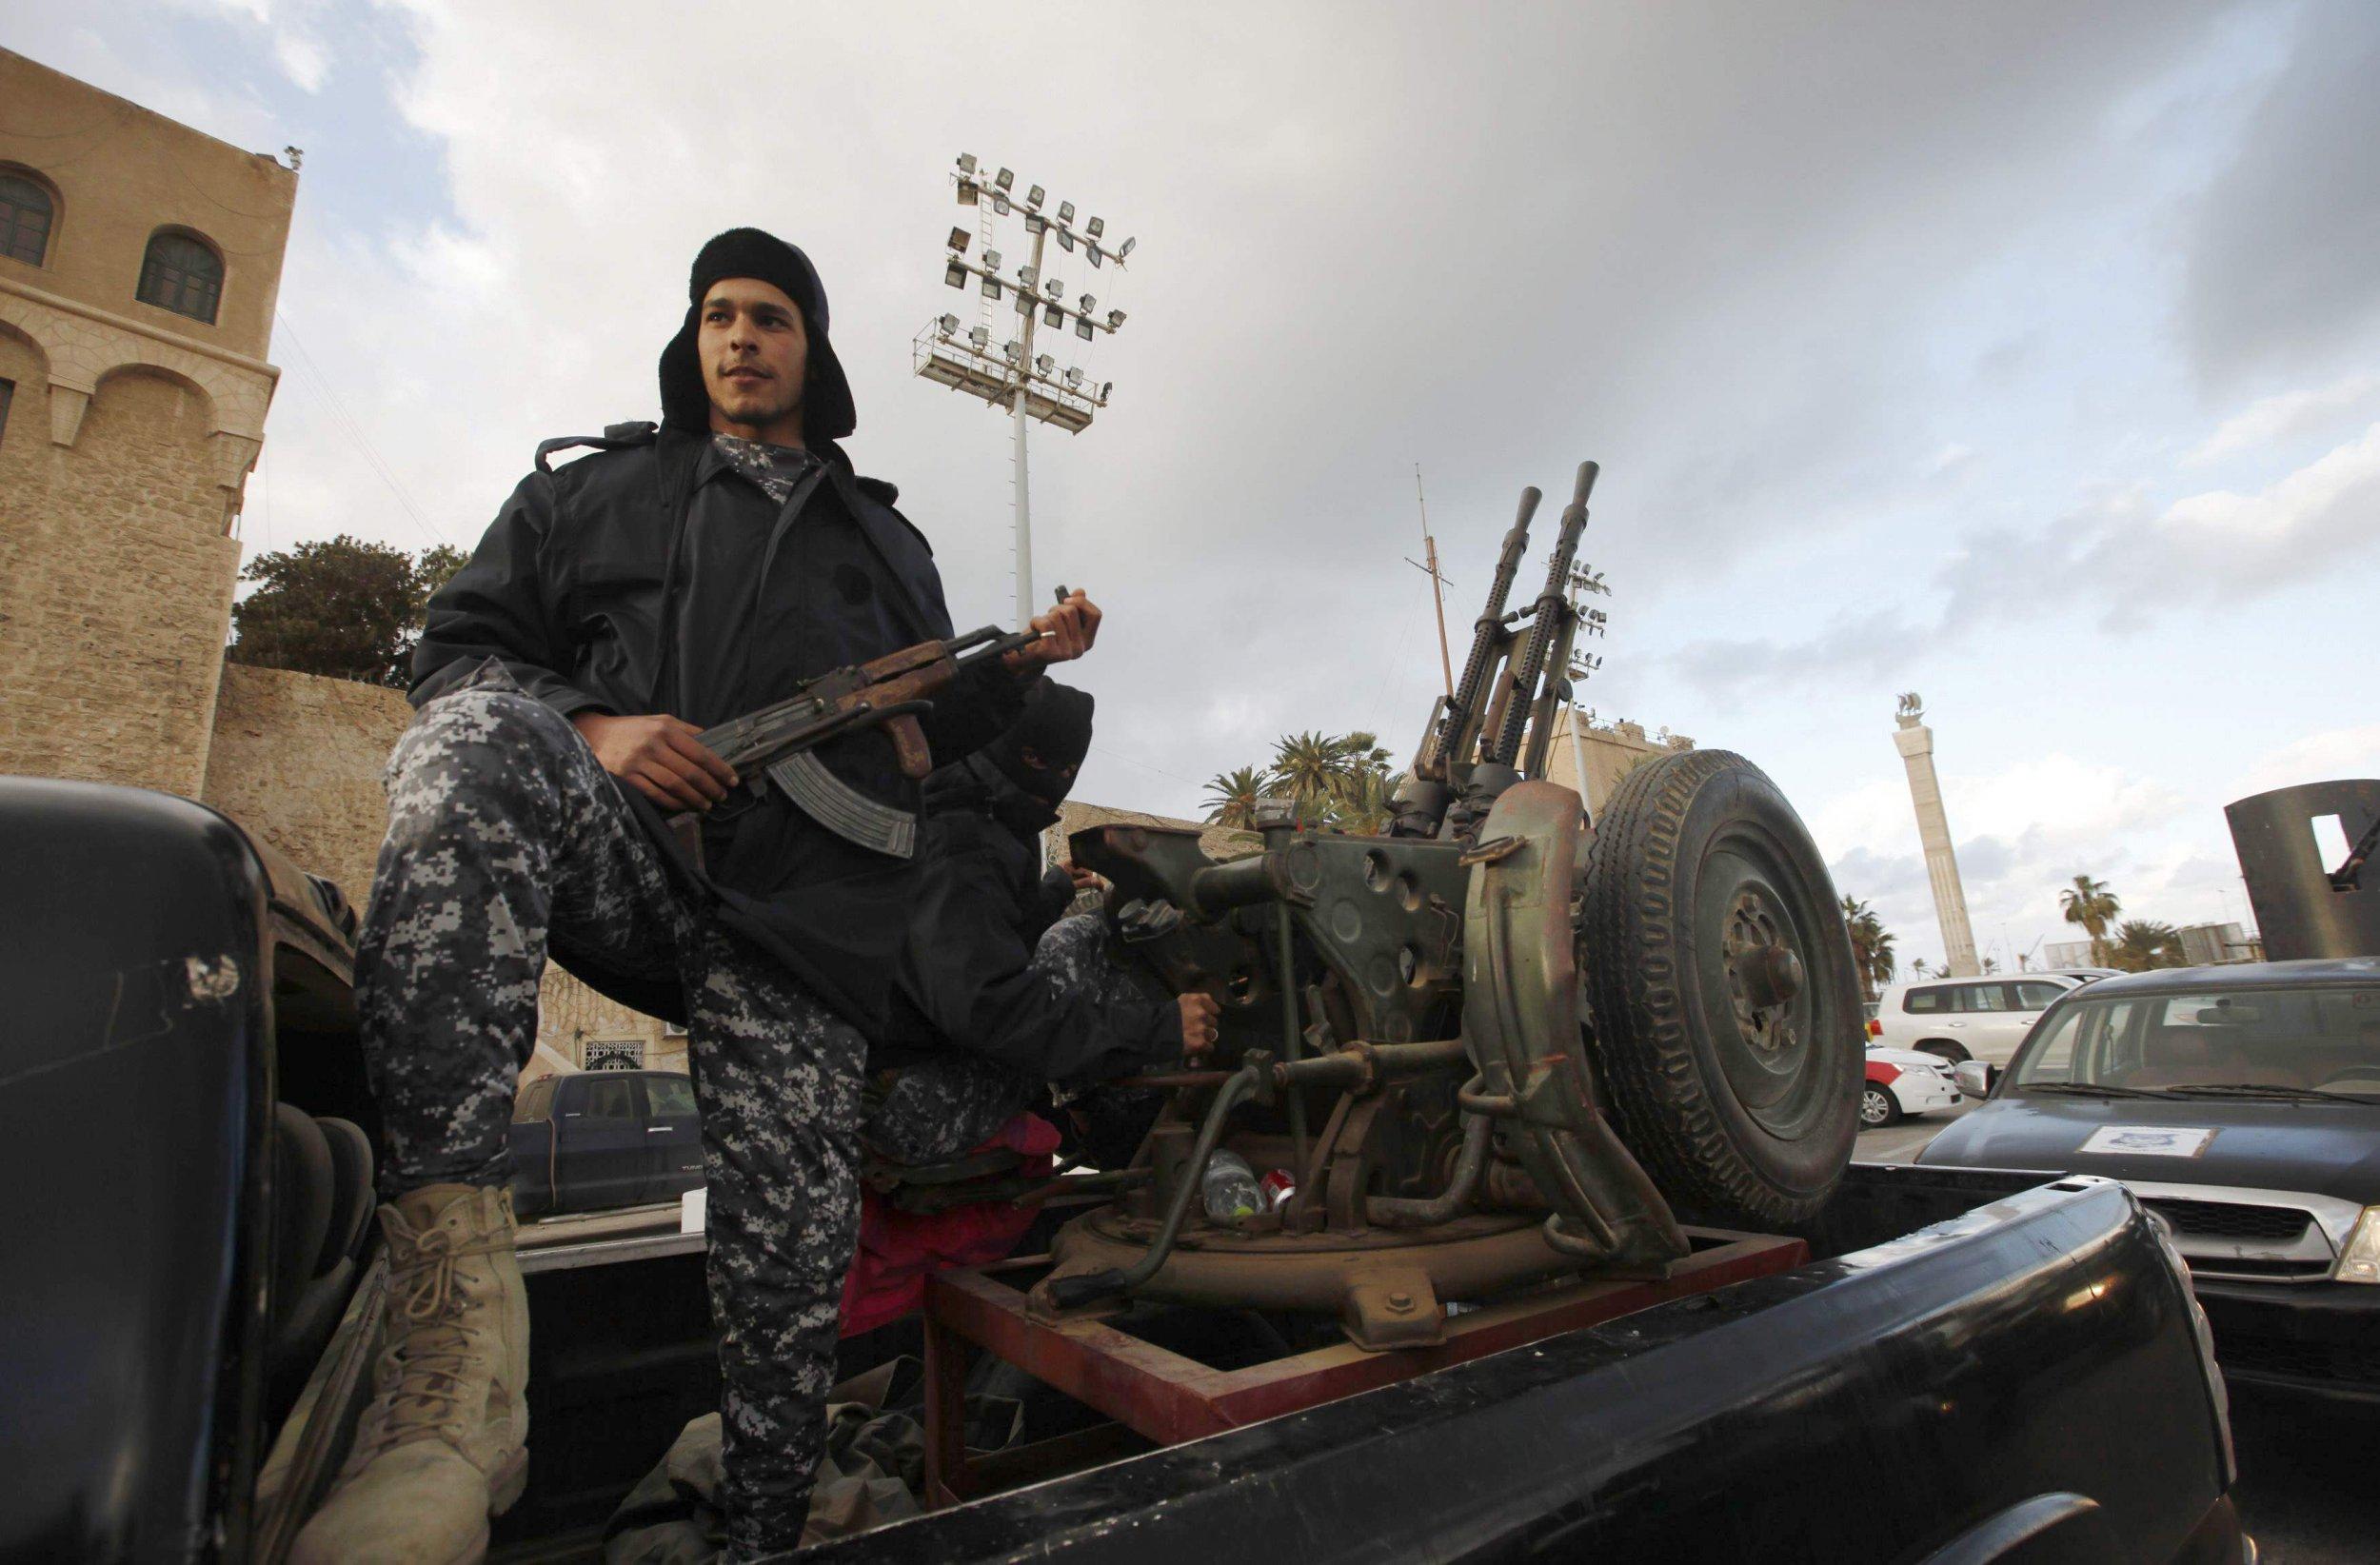 2015-02-09T195113Z_126590152_GM1EB2A0AMM01_RTRMADP_3_LIBYA-SECURITY